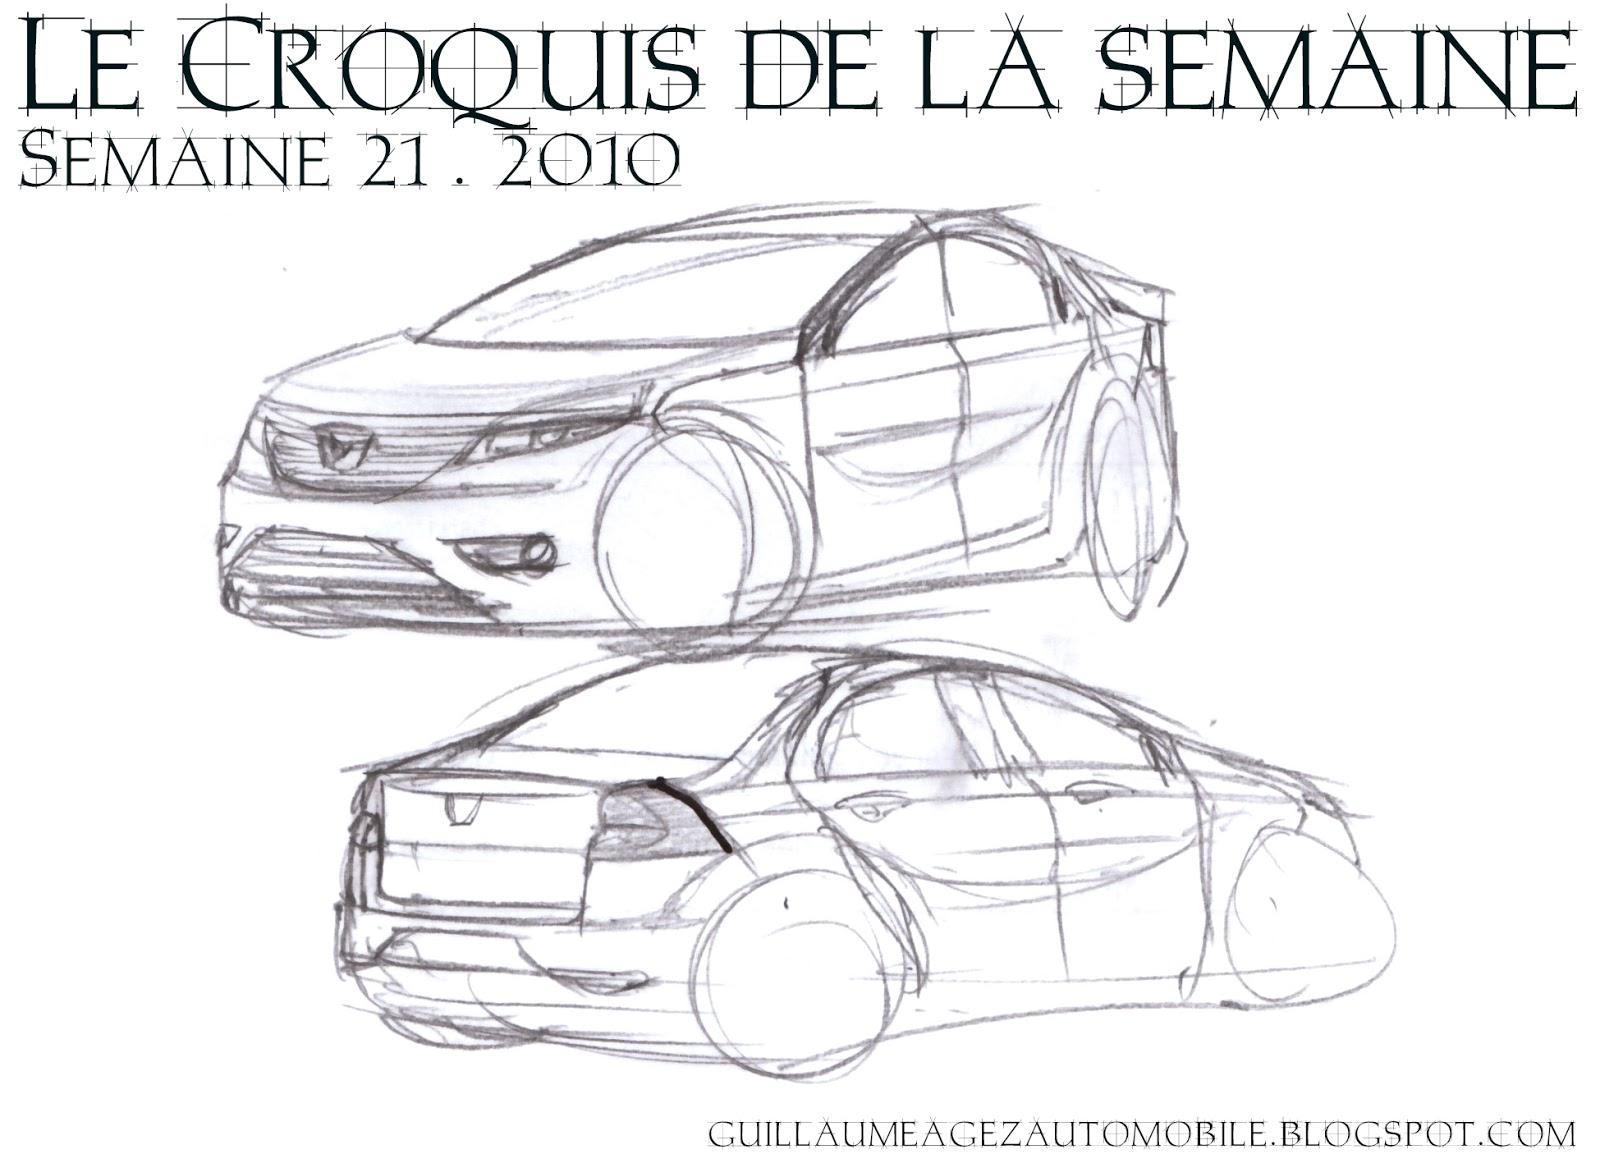 Guillaume Agez Automobile Mai